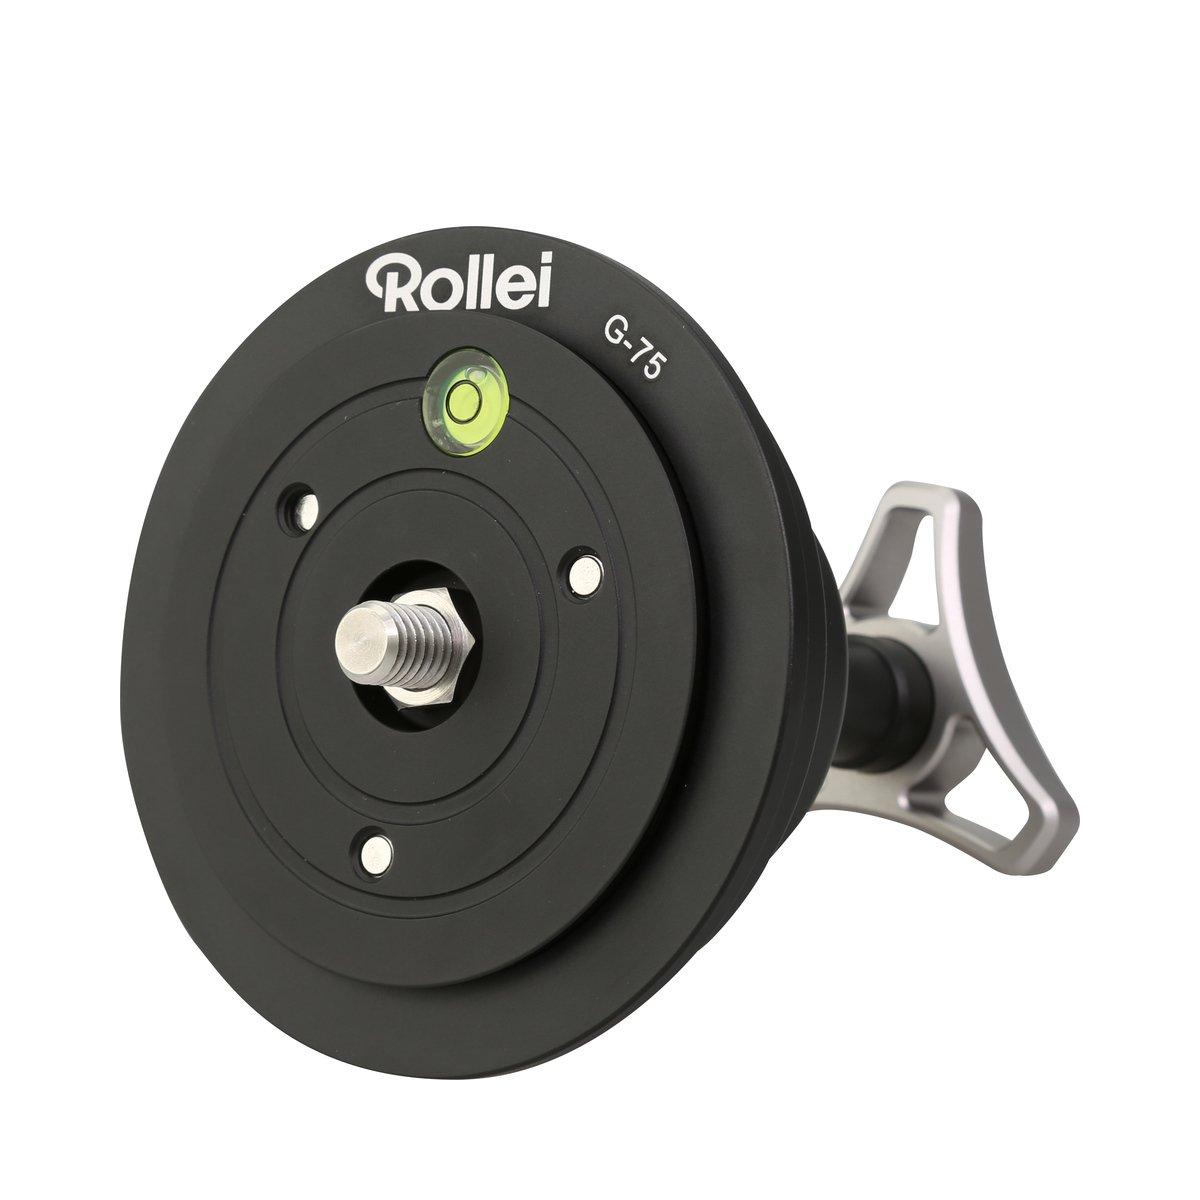 Rollei Columna Central para Rock Columna Central Rollei para Rollei Rock Solid Alpha Mark IISolid Alpha